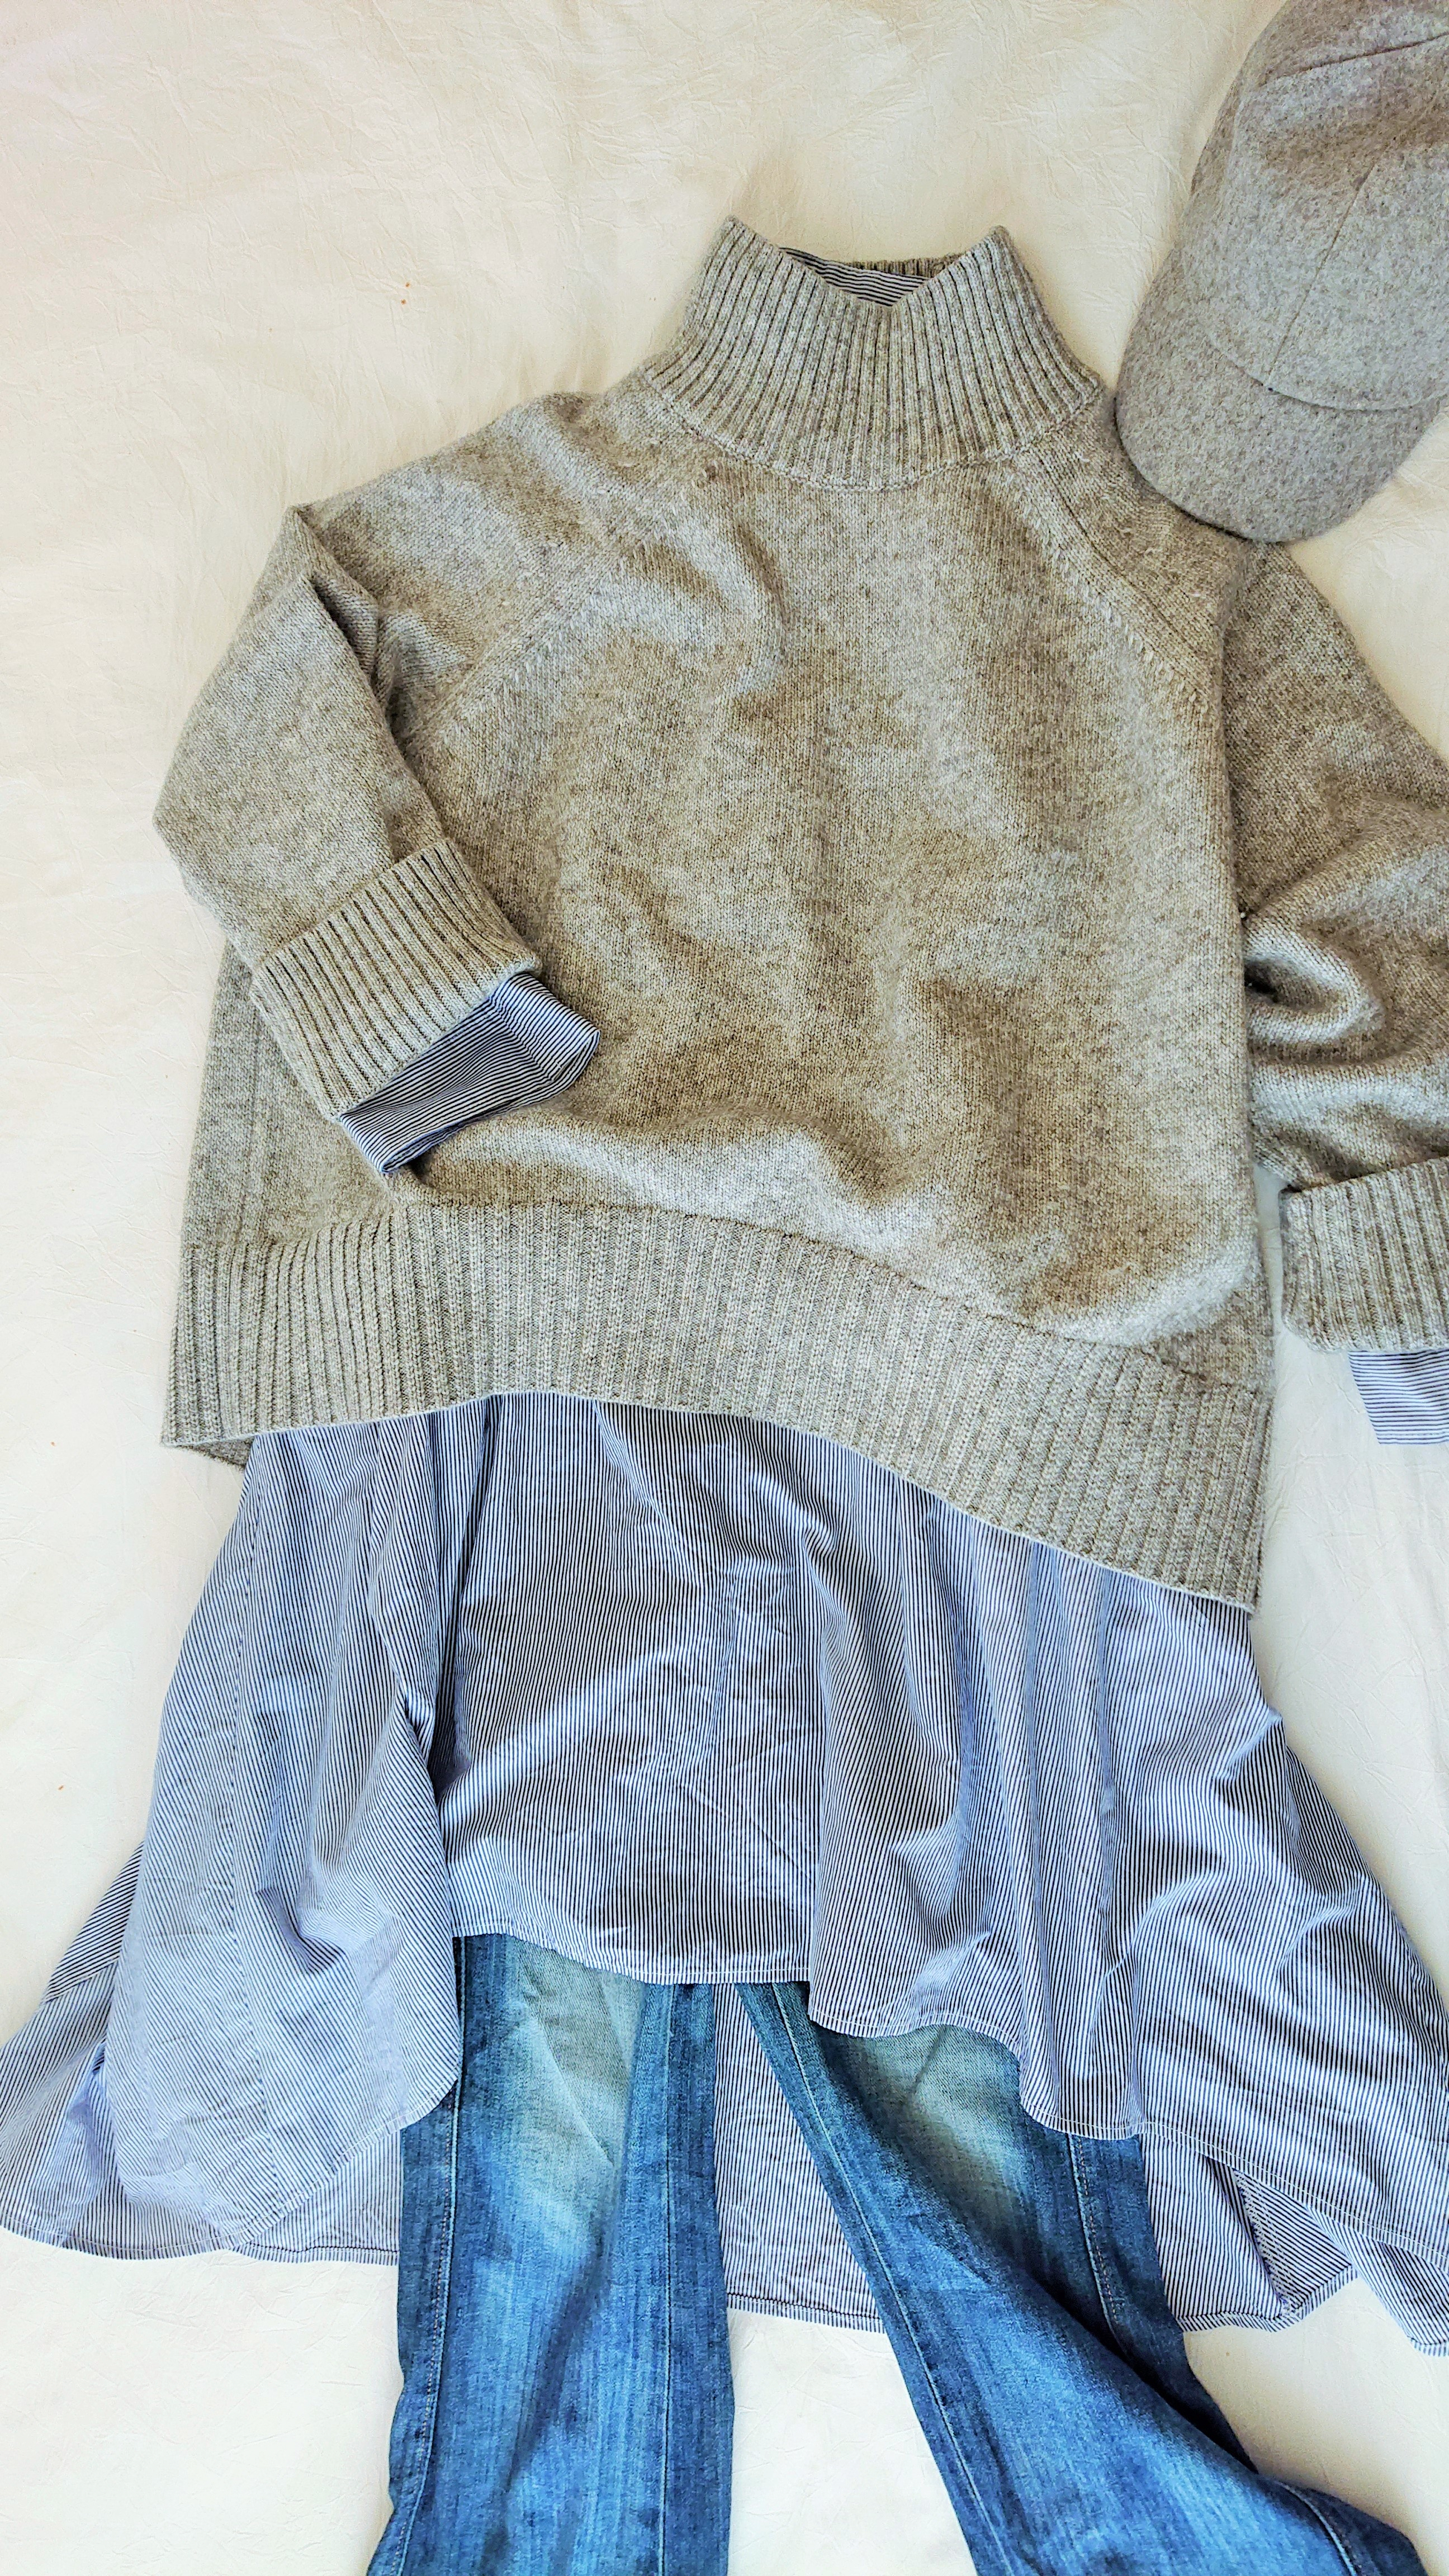 【linenu works展】東京ガールズコレクションでランウェイデビューしたワンピース tricoter/広島福山